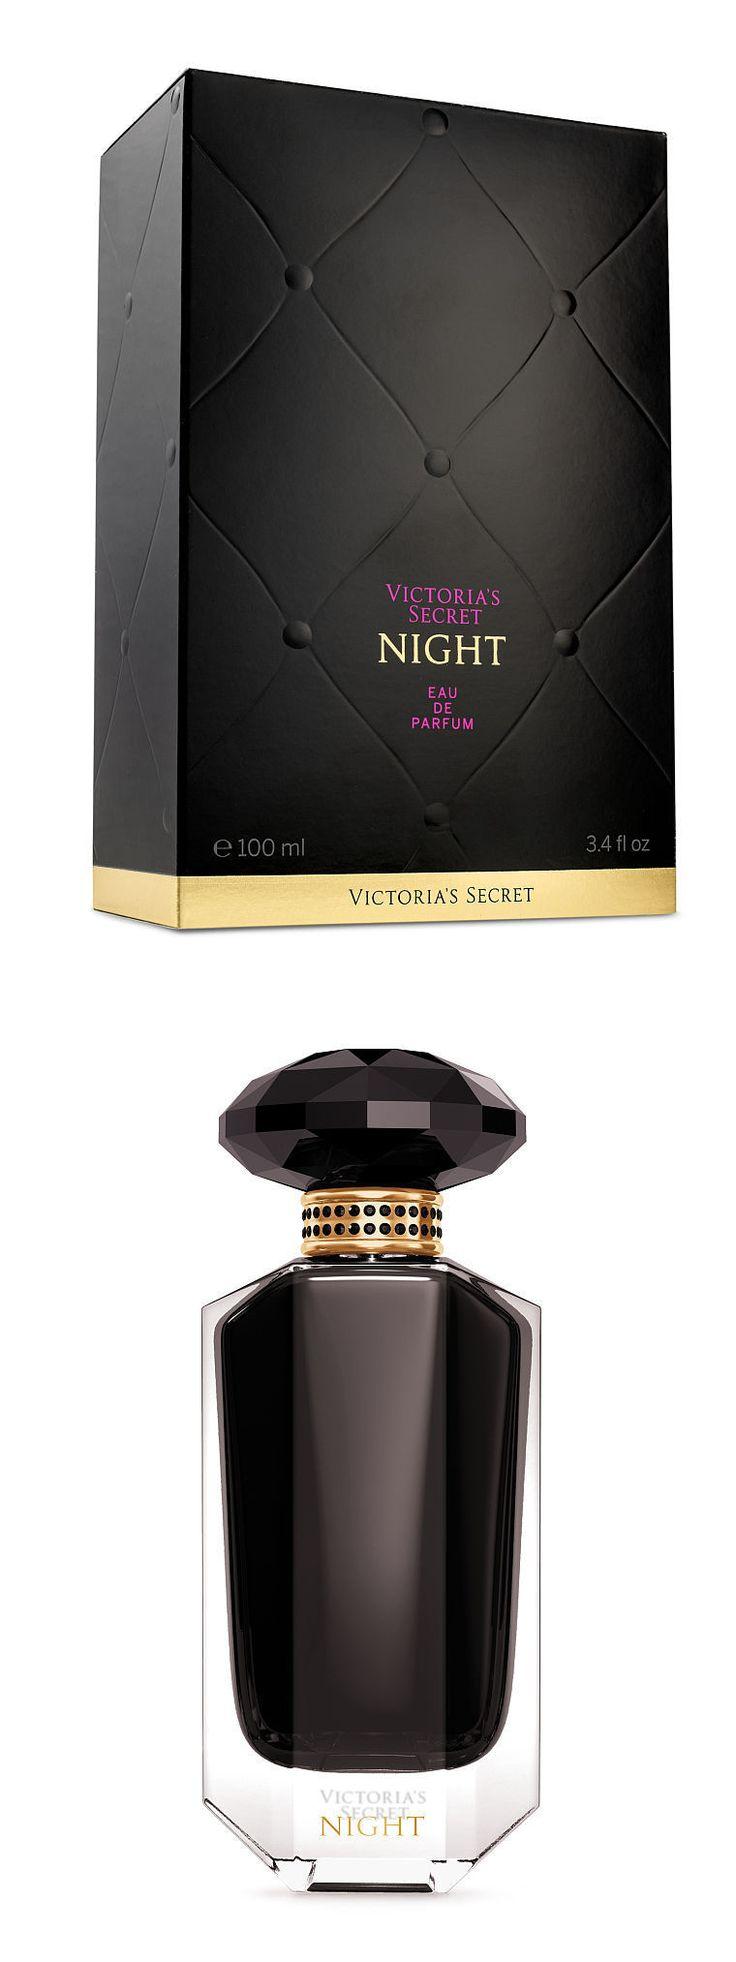 Women Fragrance: Victoria S Secret Night 3.4Oz 100Ml Eau De Parfum Spray Women S Perfume *New* -> BUY IT NOW ONLY: $33.99 on eBay!